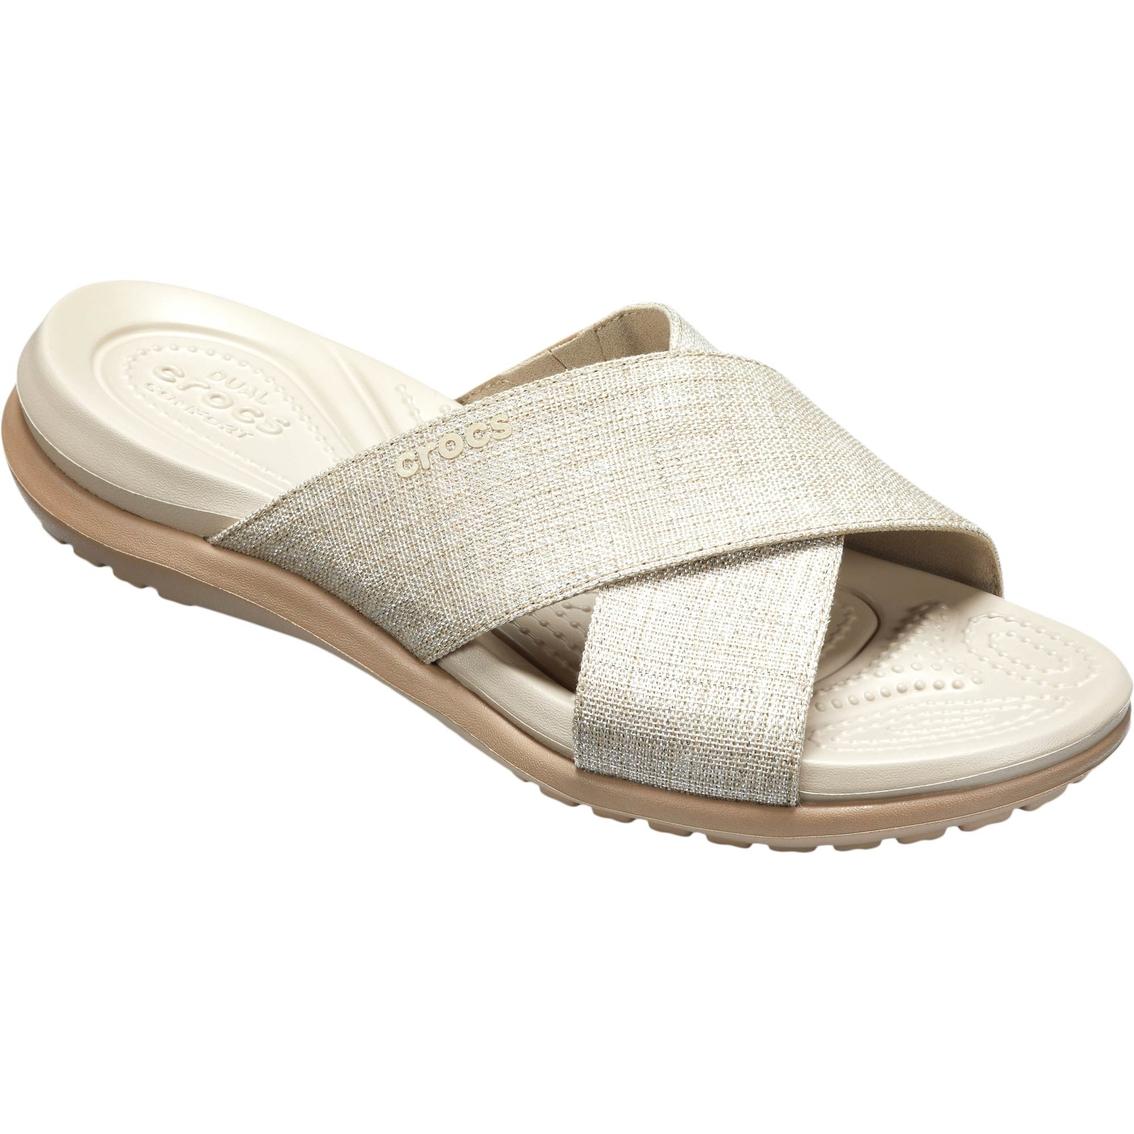 b3571fb33950 Crocs Capri Shimmer X Band Sandals